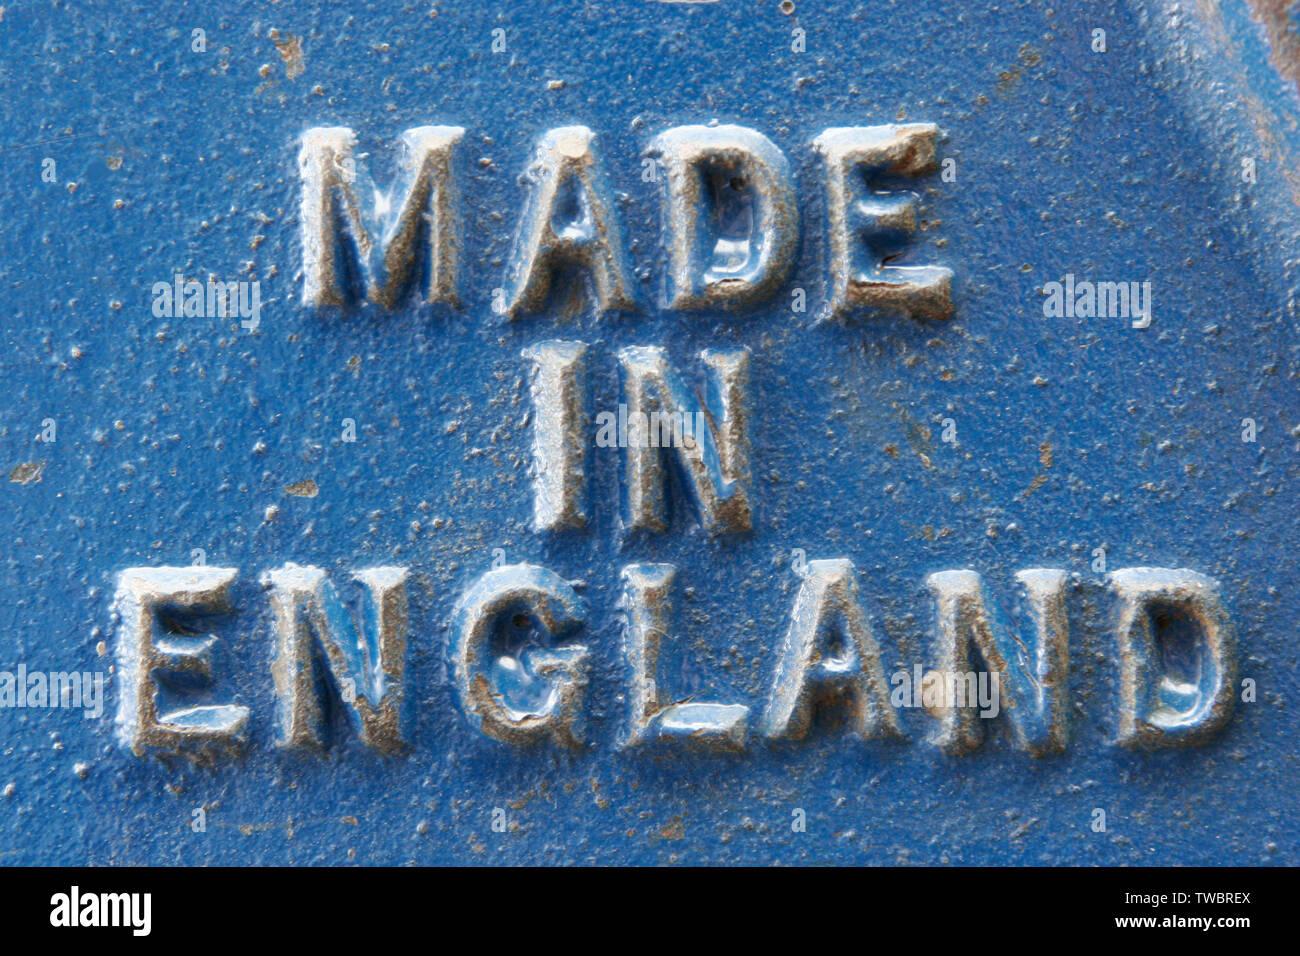 Tornillo de banco de acero británico con grabado de 'made in England' Foto de stock